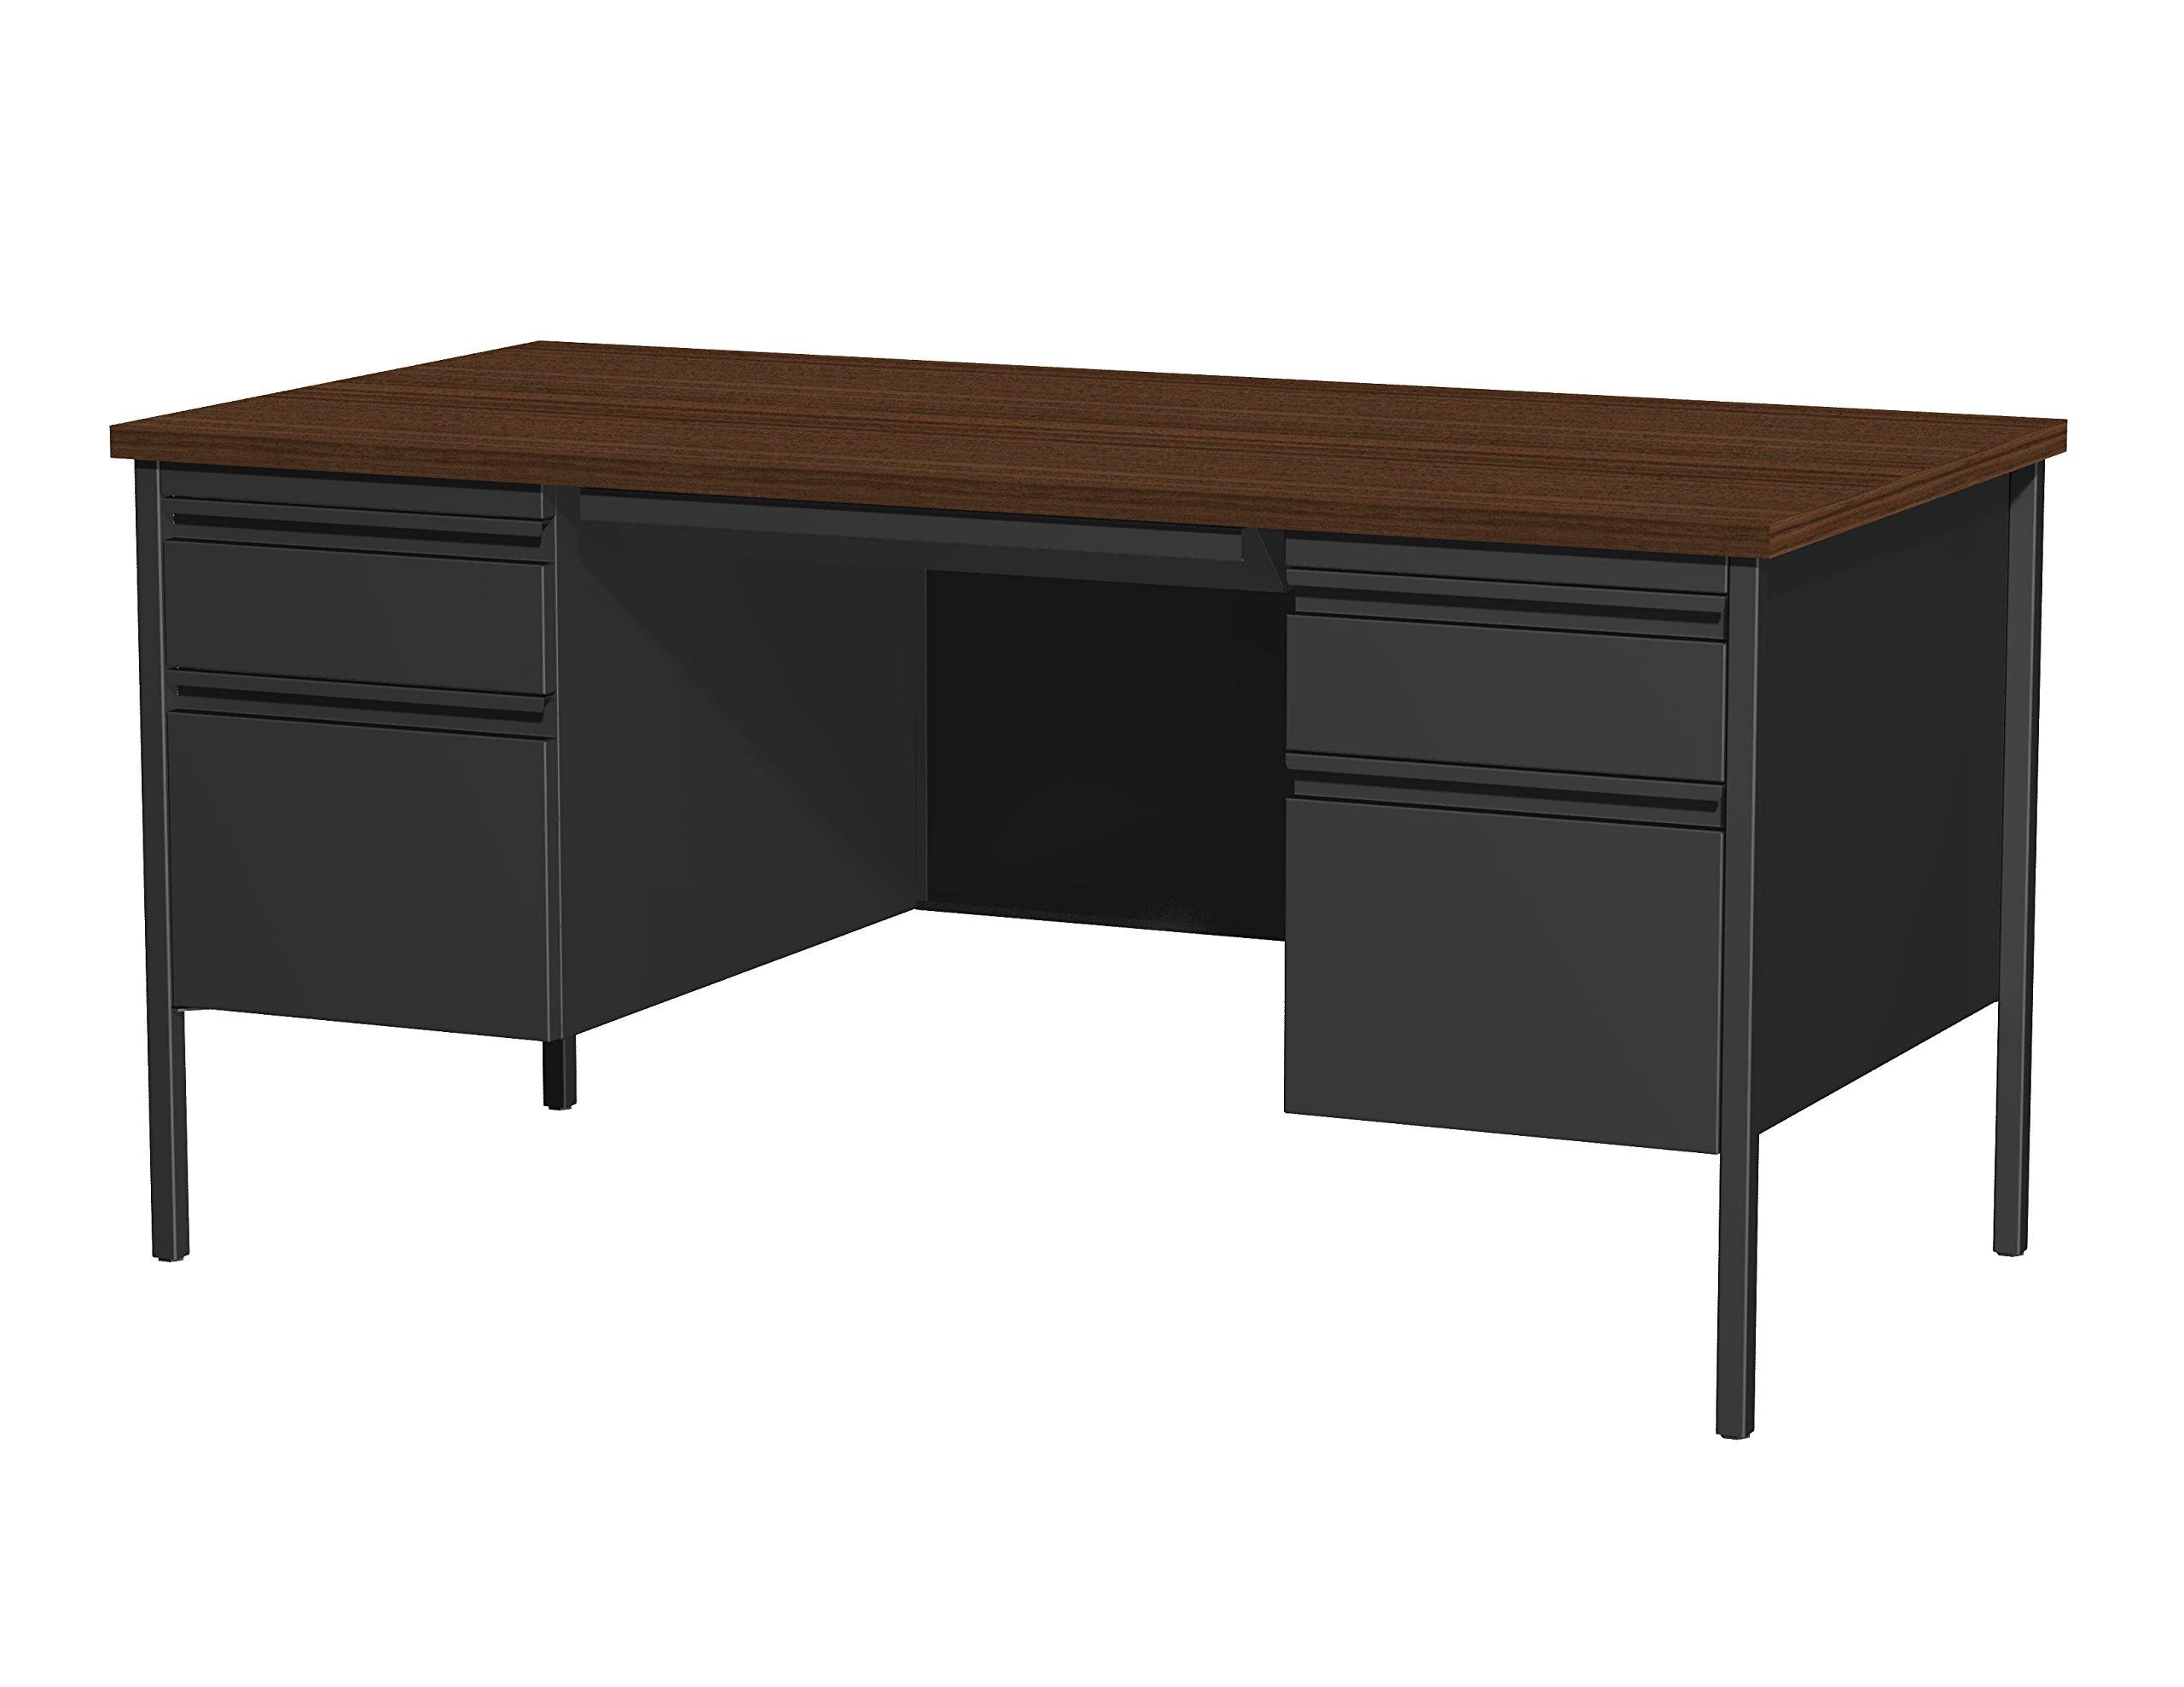 Office Dimensions Double Pedestal Desk, 30-Inch by 60-Inch, Black/Walnut